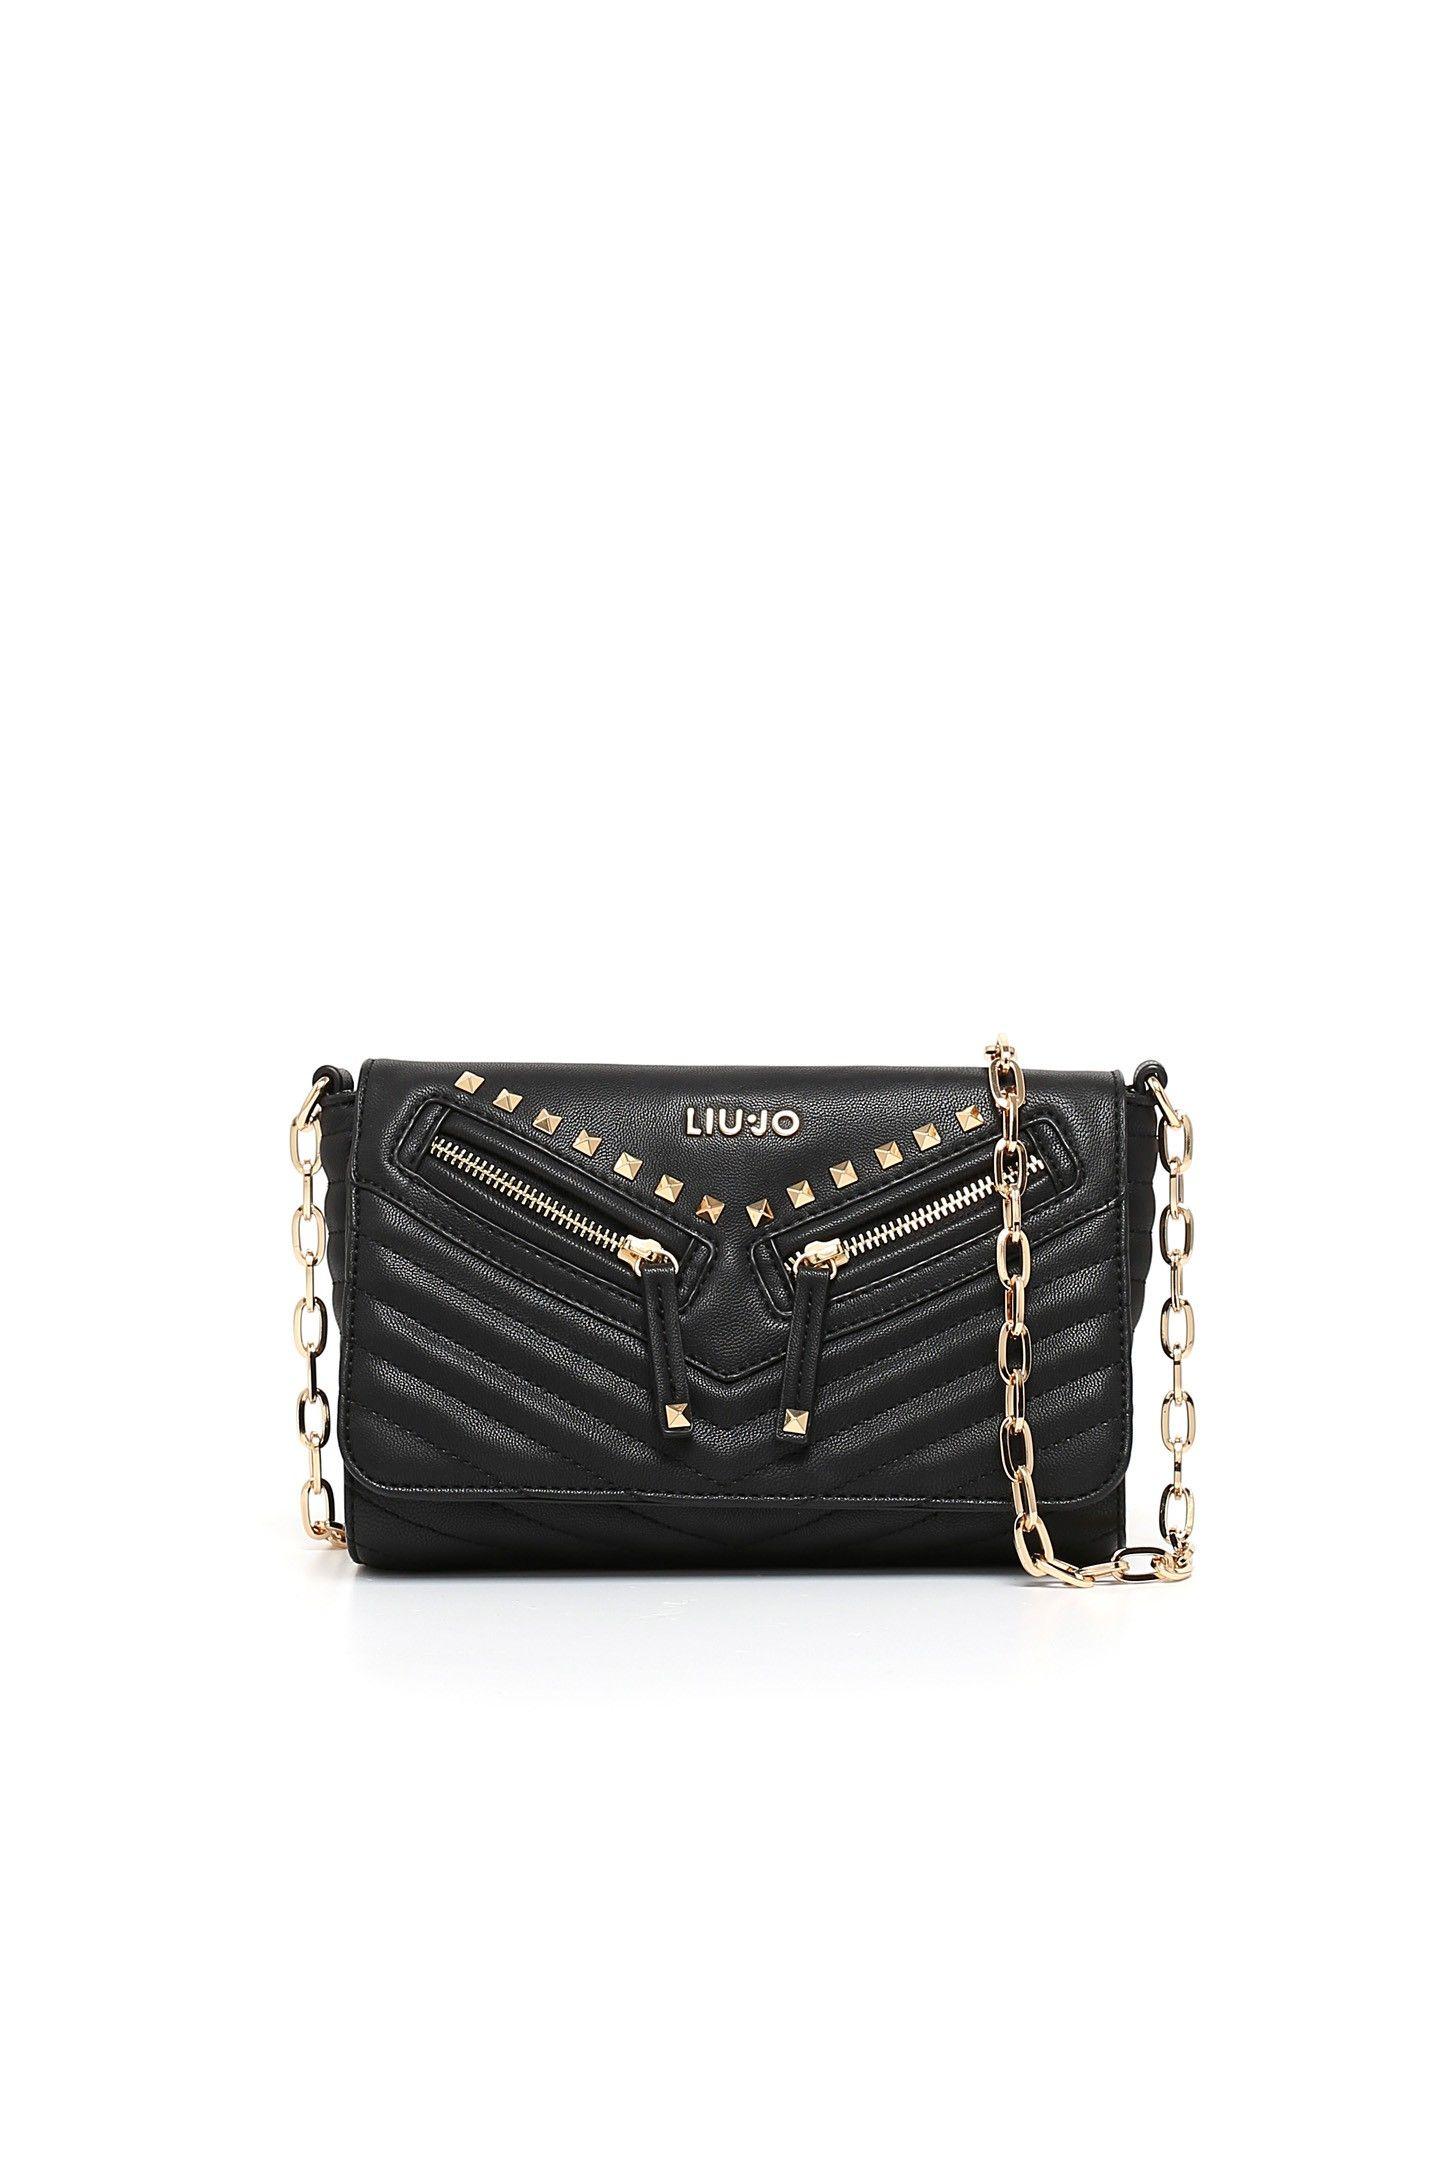 1233a29bd29b Liu Jo 'Saetta' Small Crossbody Bag in Black | Lyst | acc. | Small ...